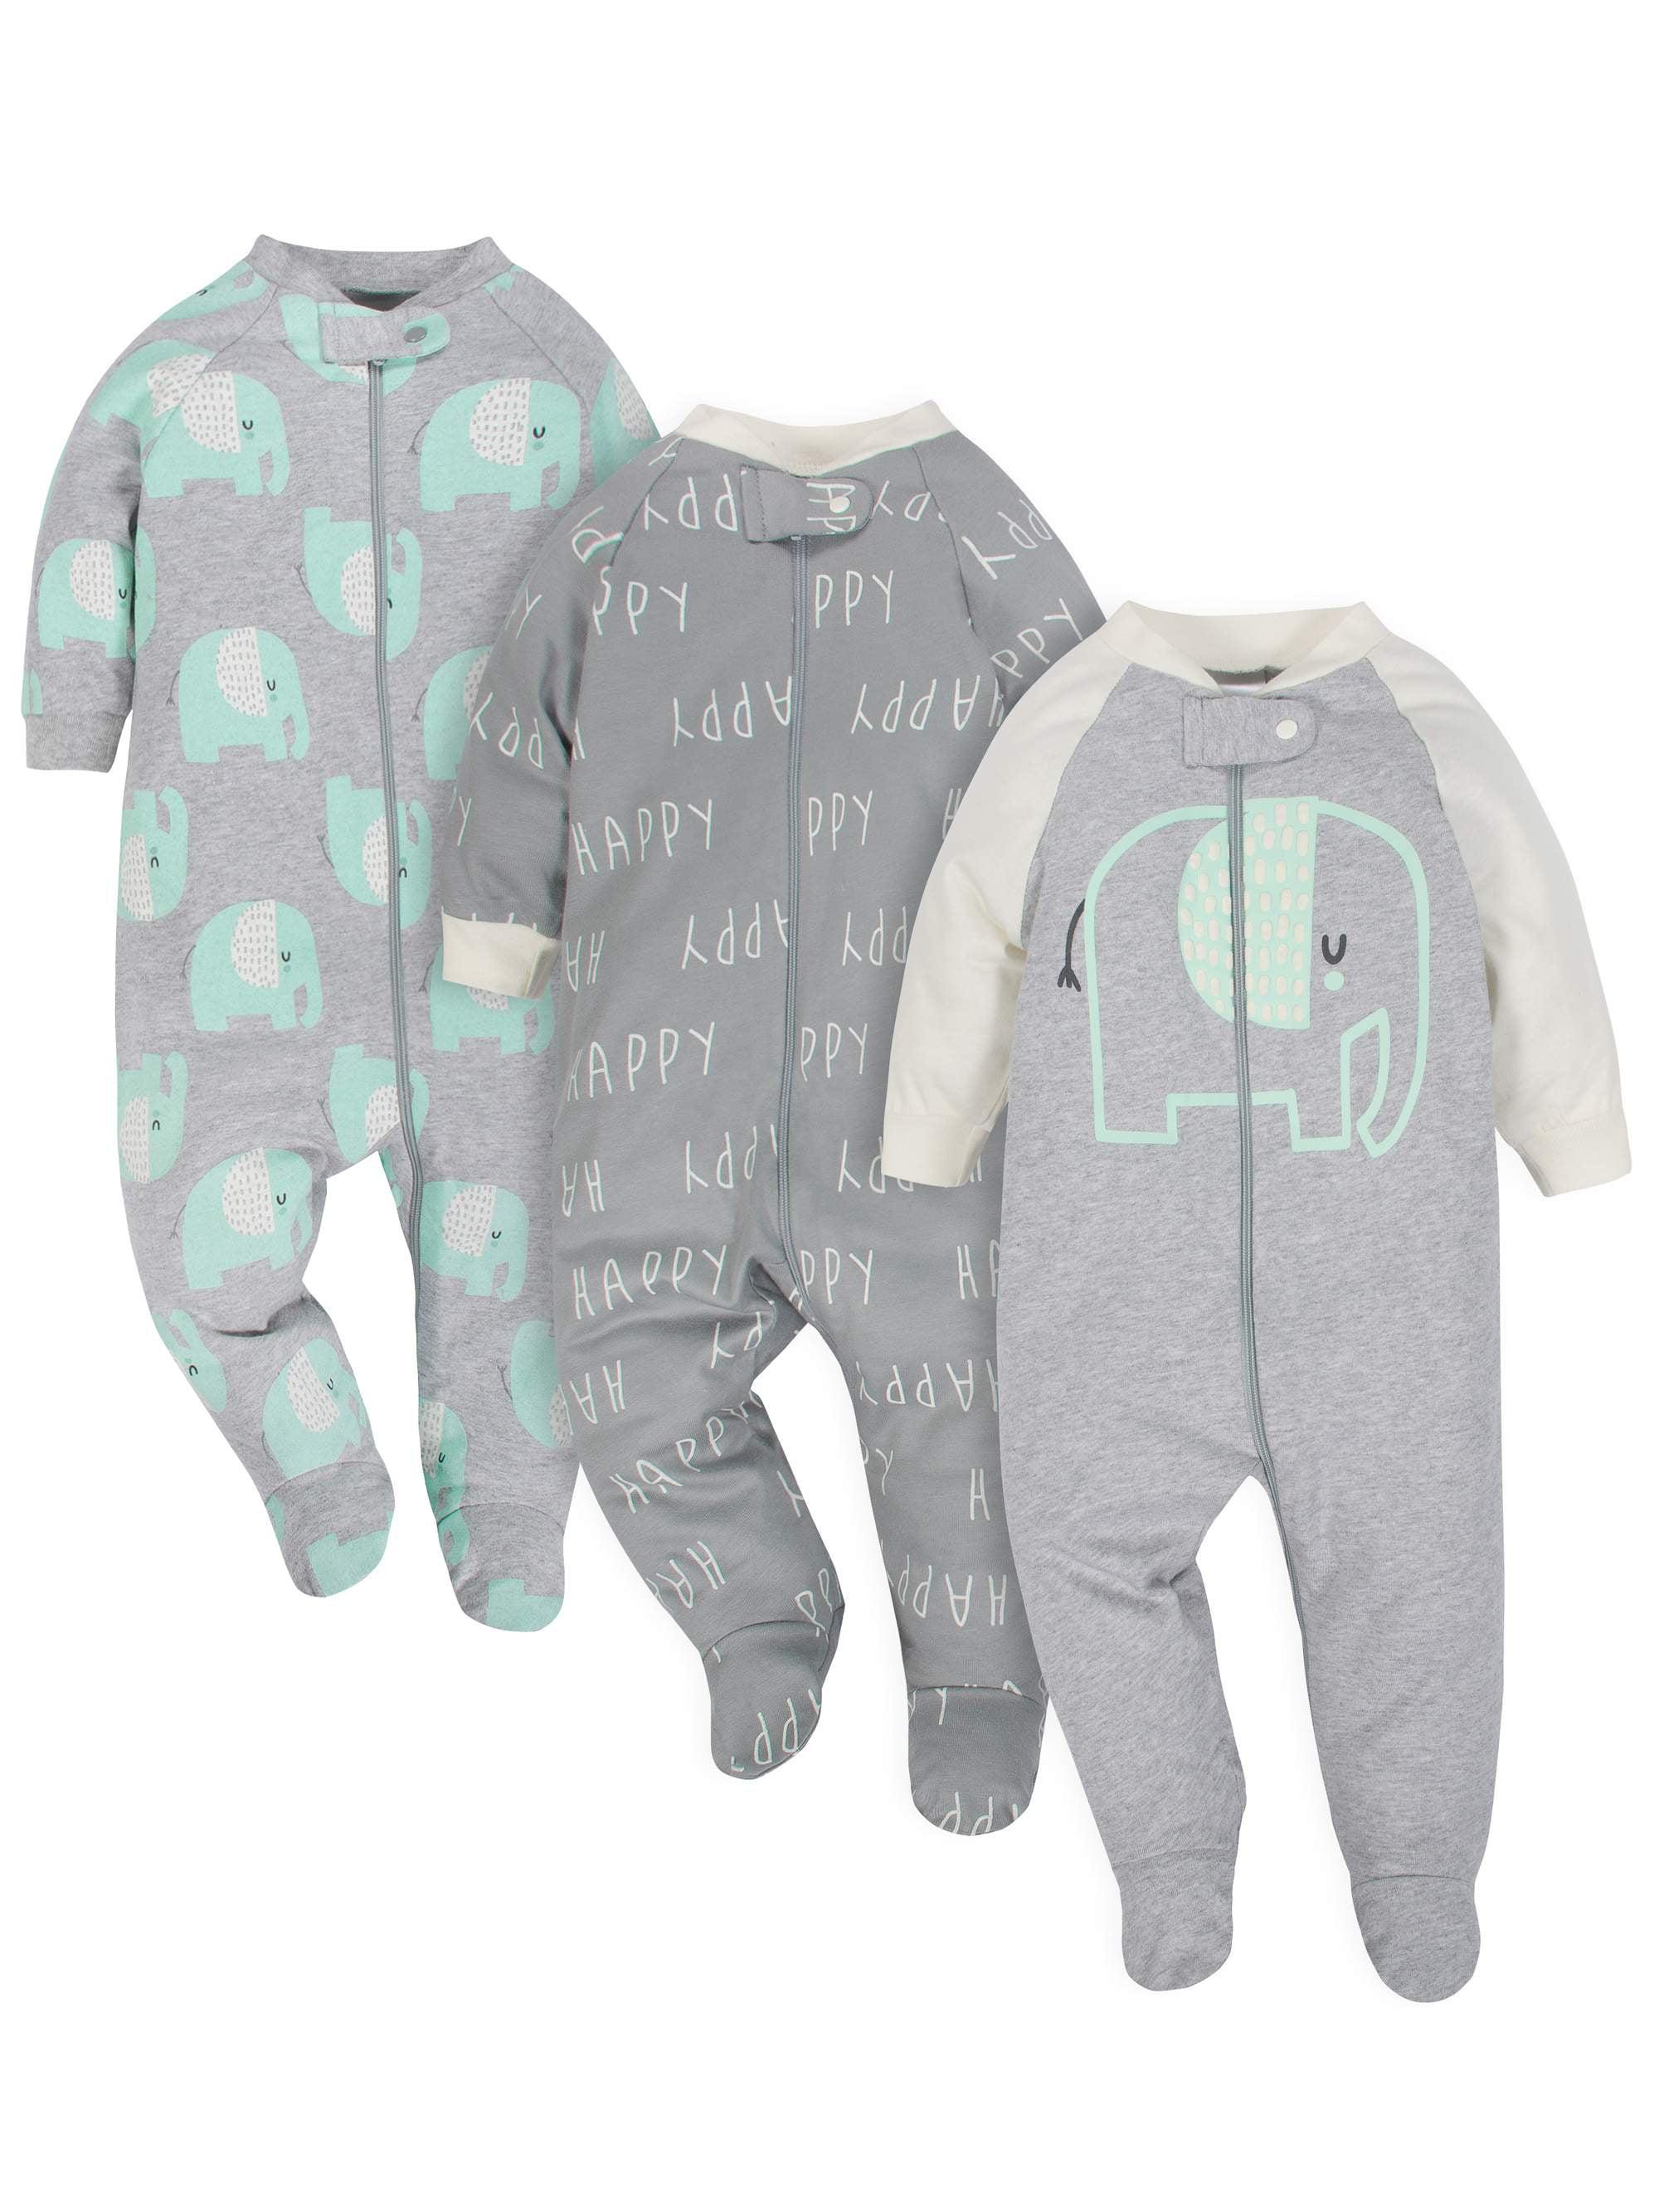 Organic Cotton Sleep N Play, 3pk (Baby Boy or Baby Girl Unisex)